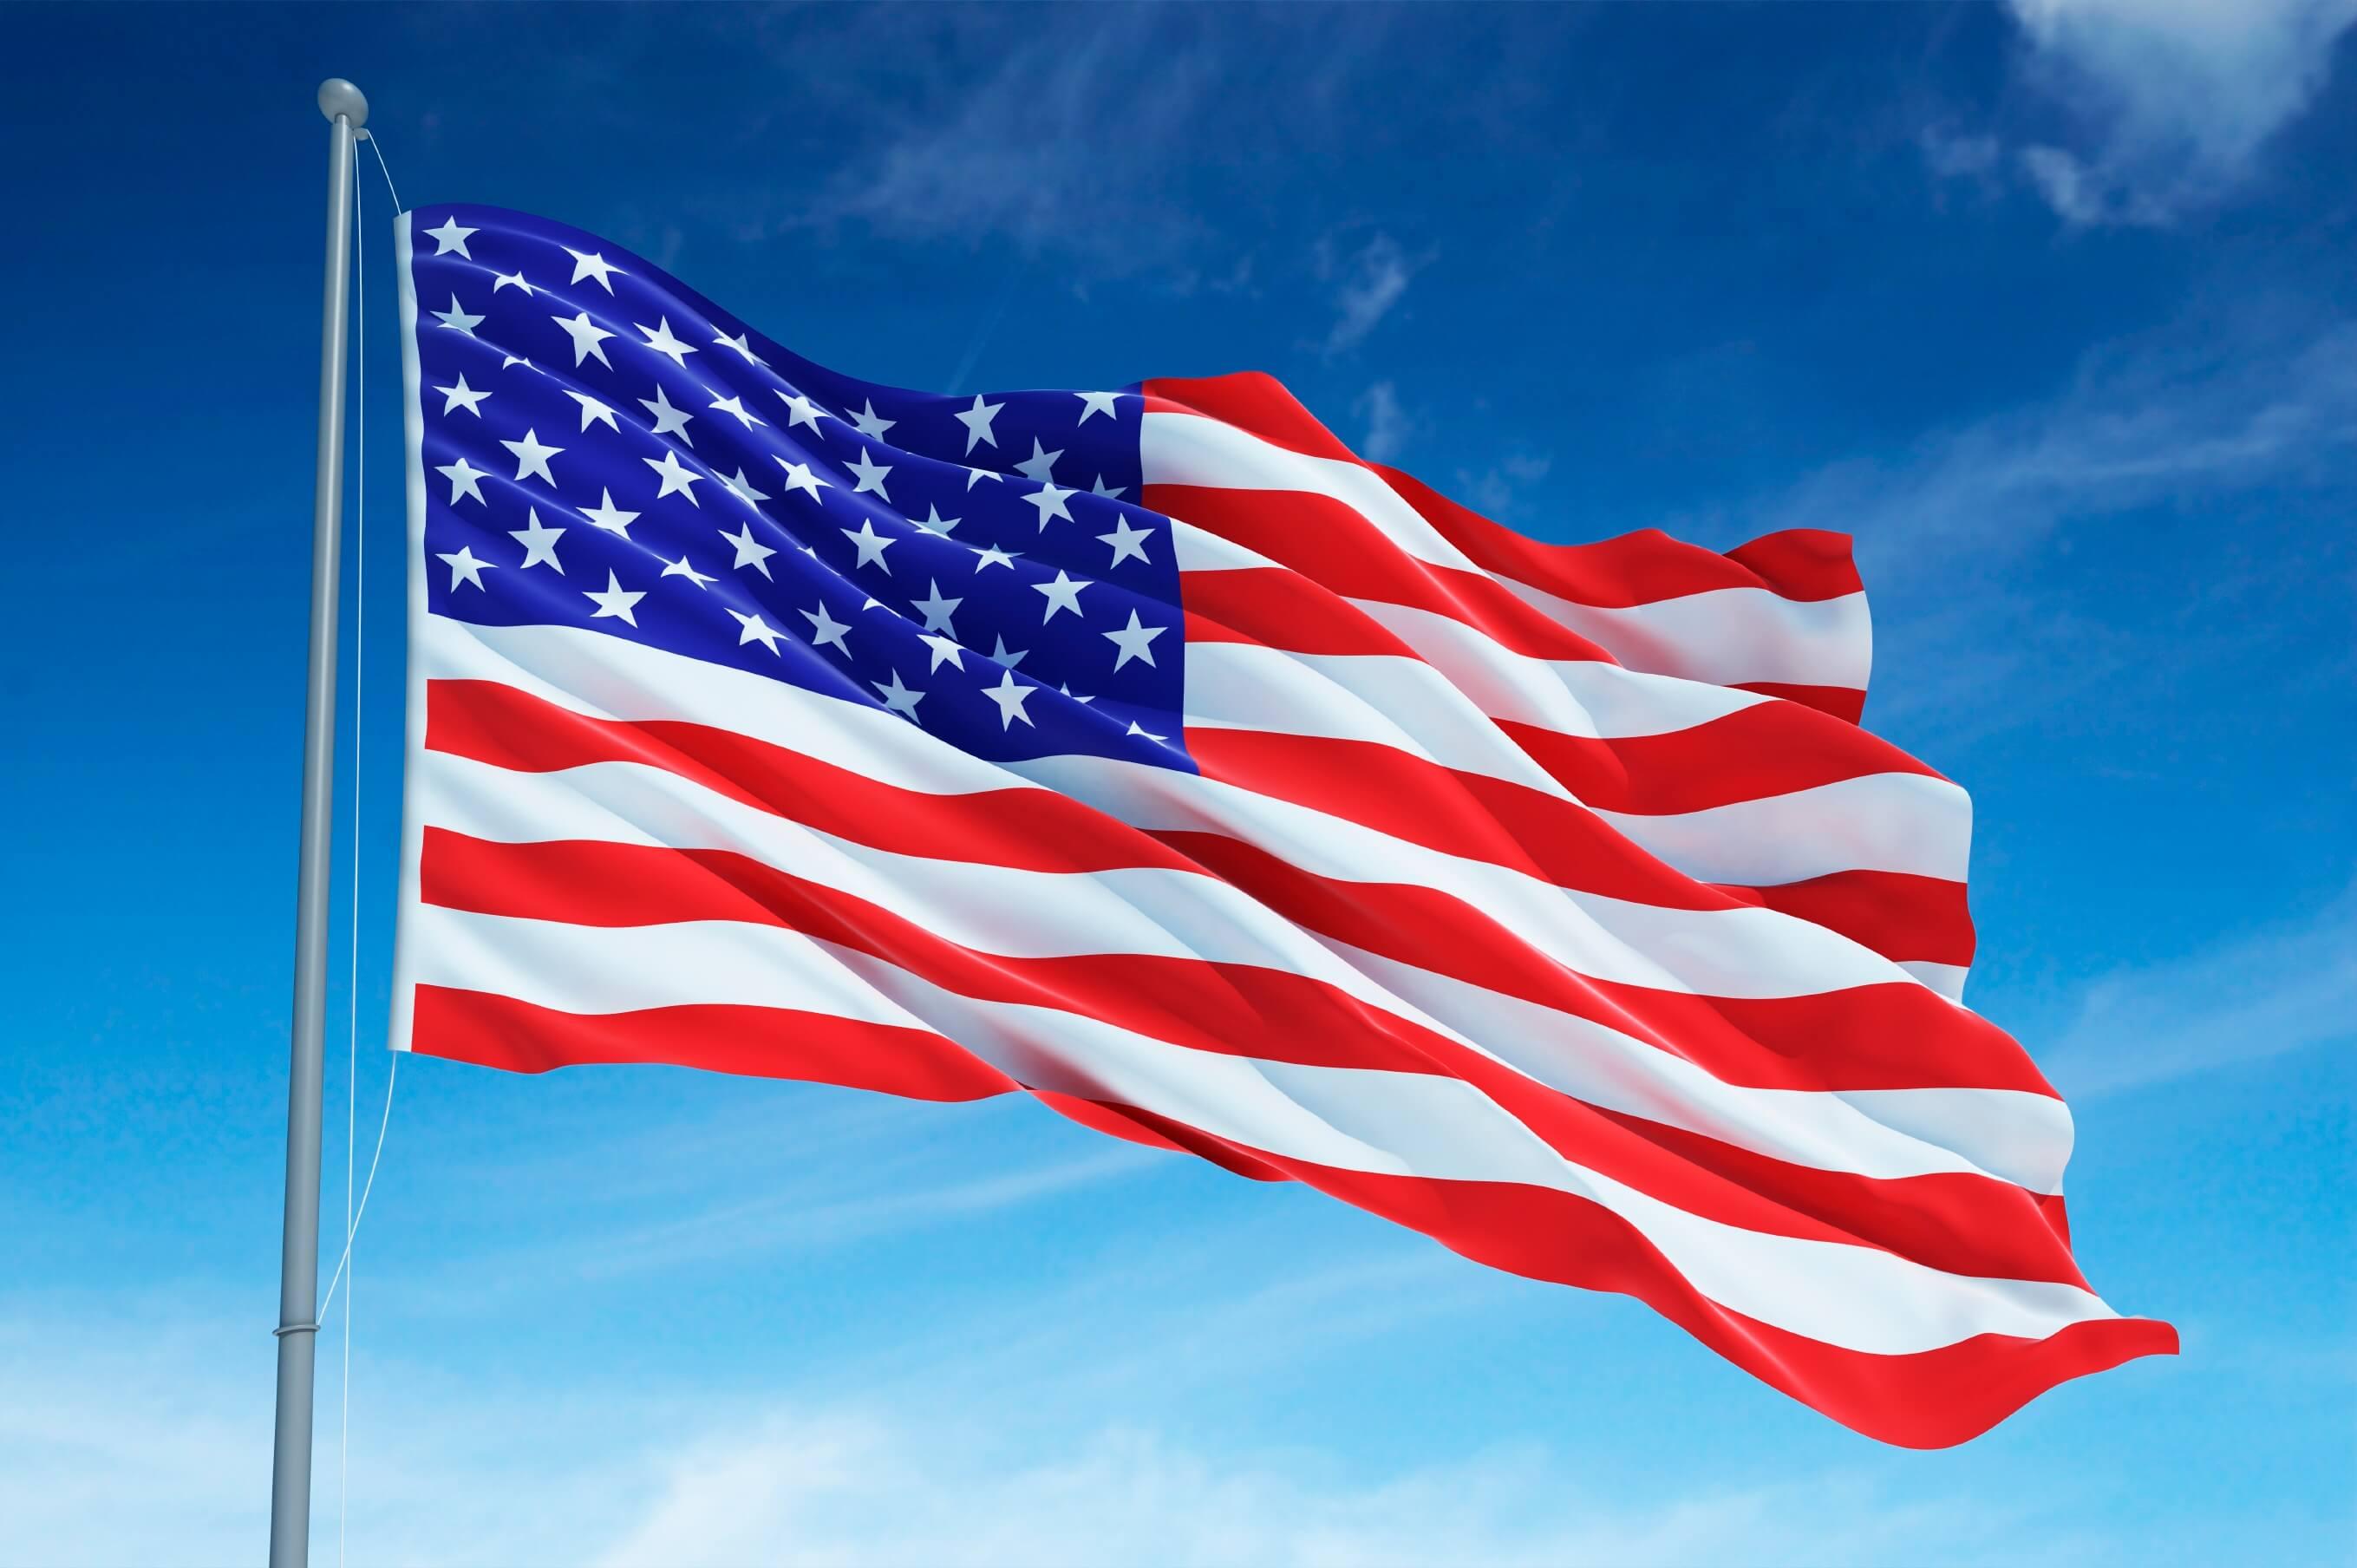 AmericanFlag